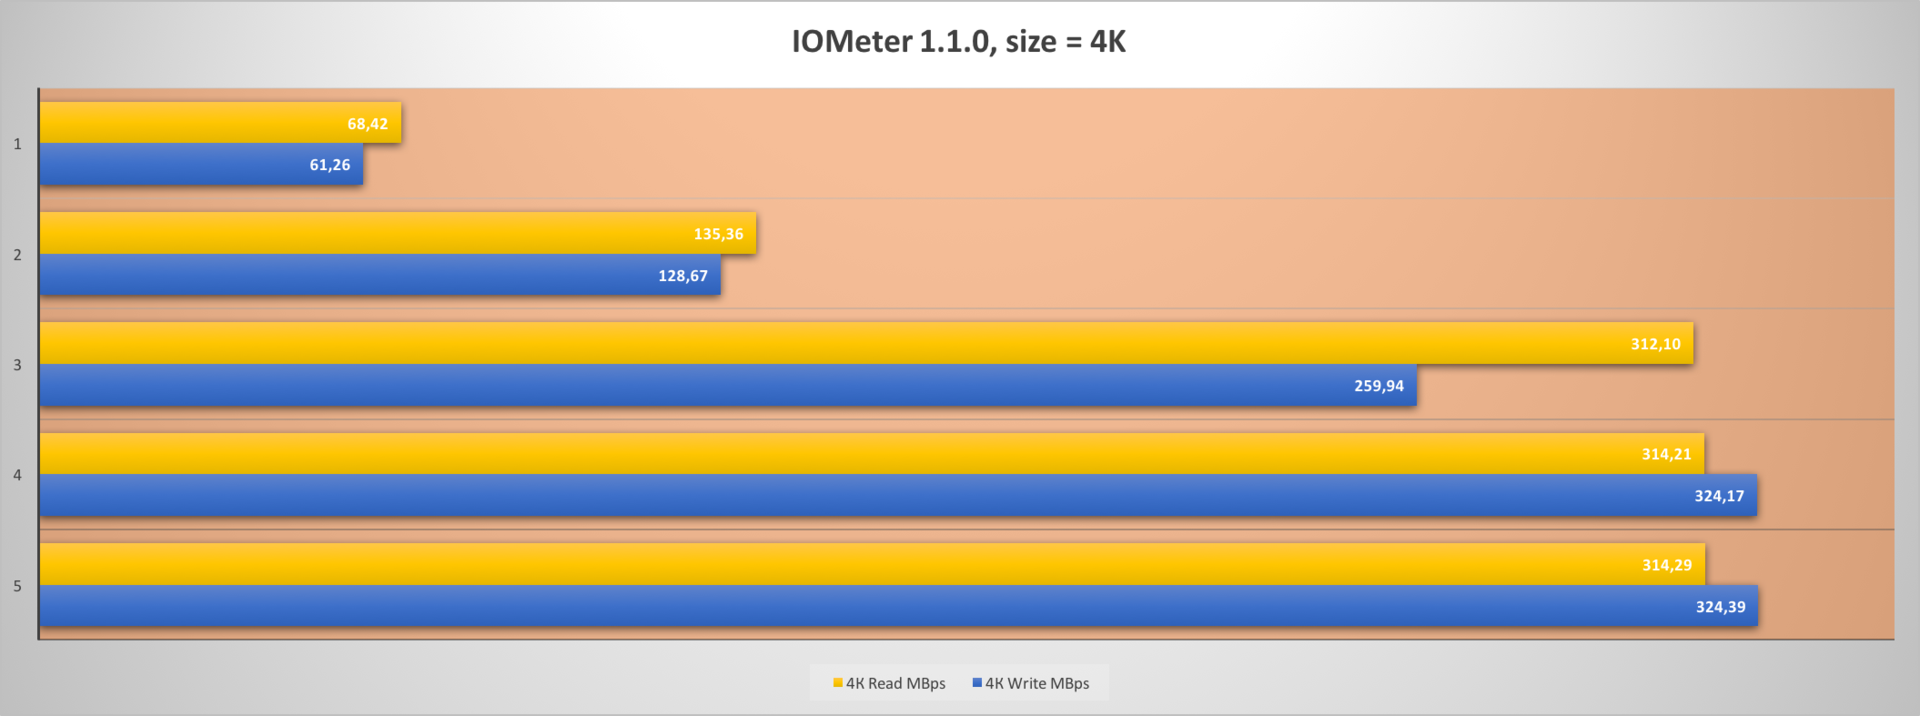 Обзор твердотельного накопителя Kingston UV400 480 Gb — SSD с «изюмом» - 12